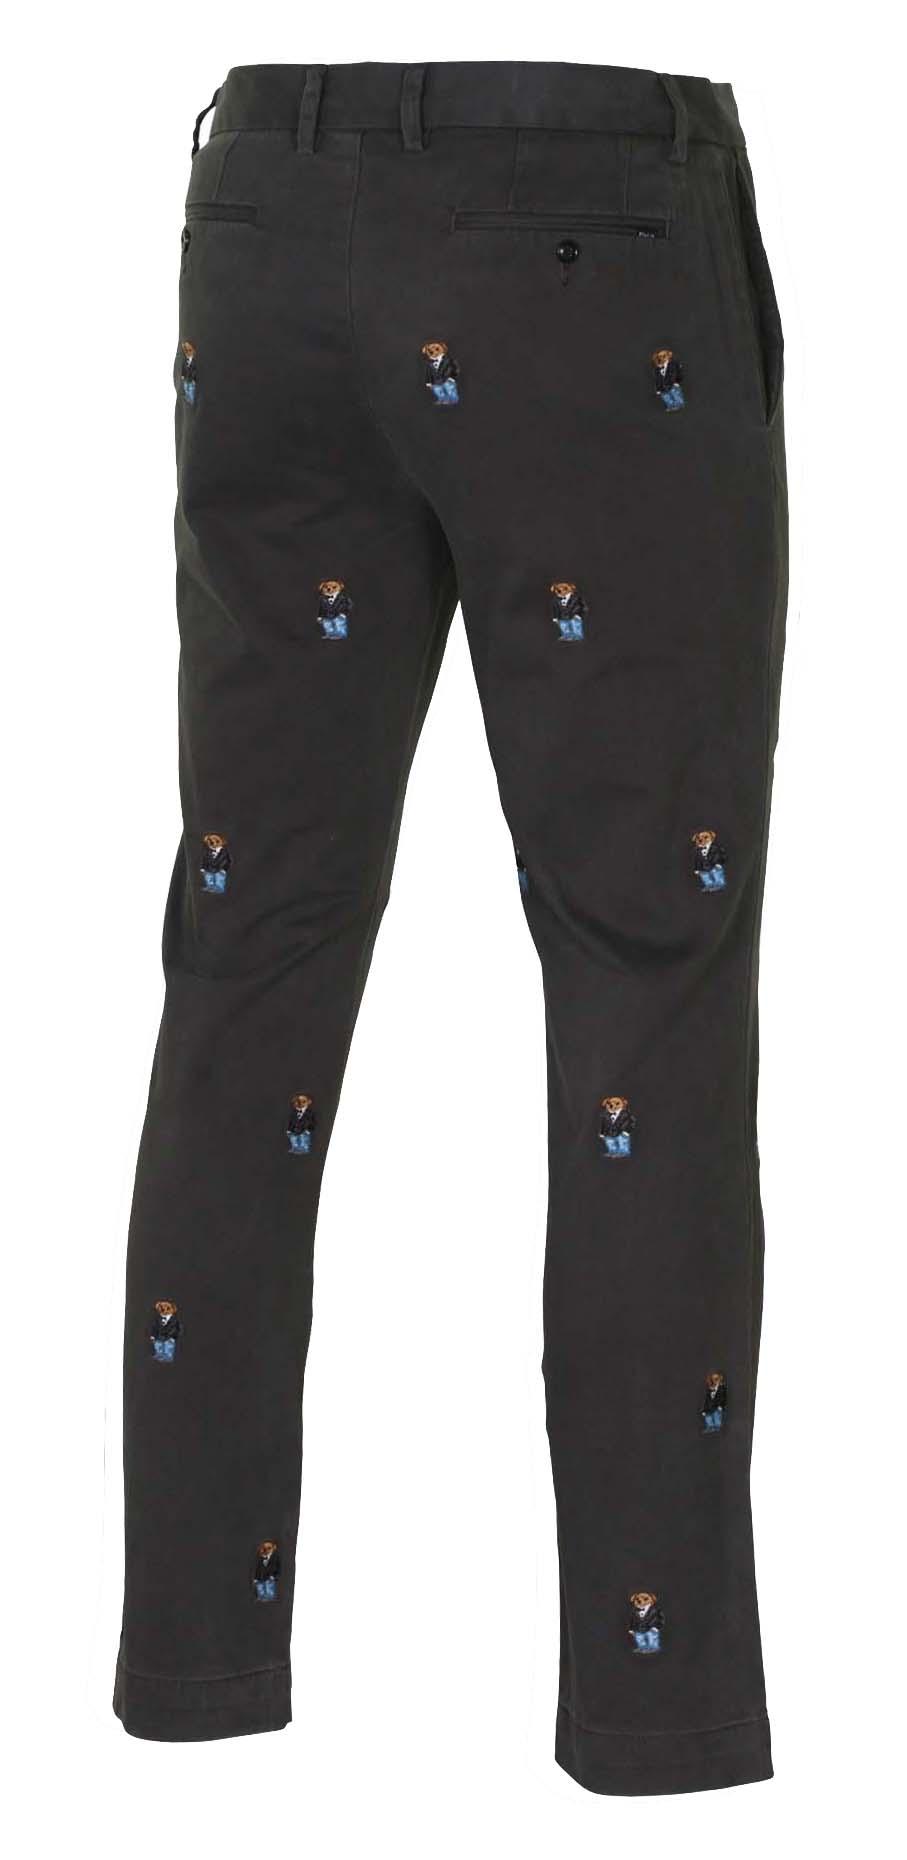 38b2894d40aed Polo Ralph Lauren Men s Suit Bear Slim Fit Chino Pants-Faded Black ...